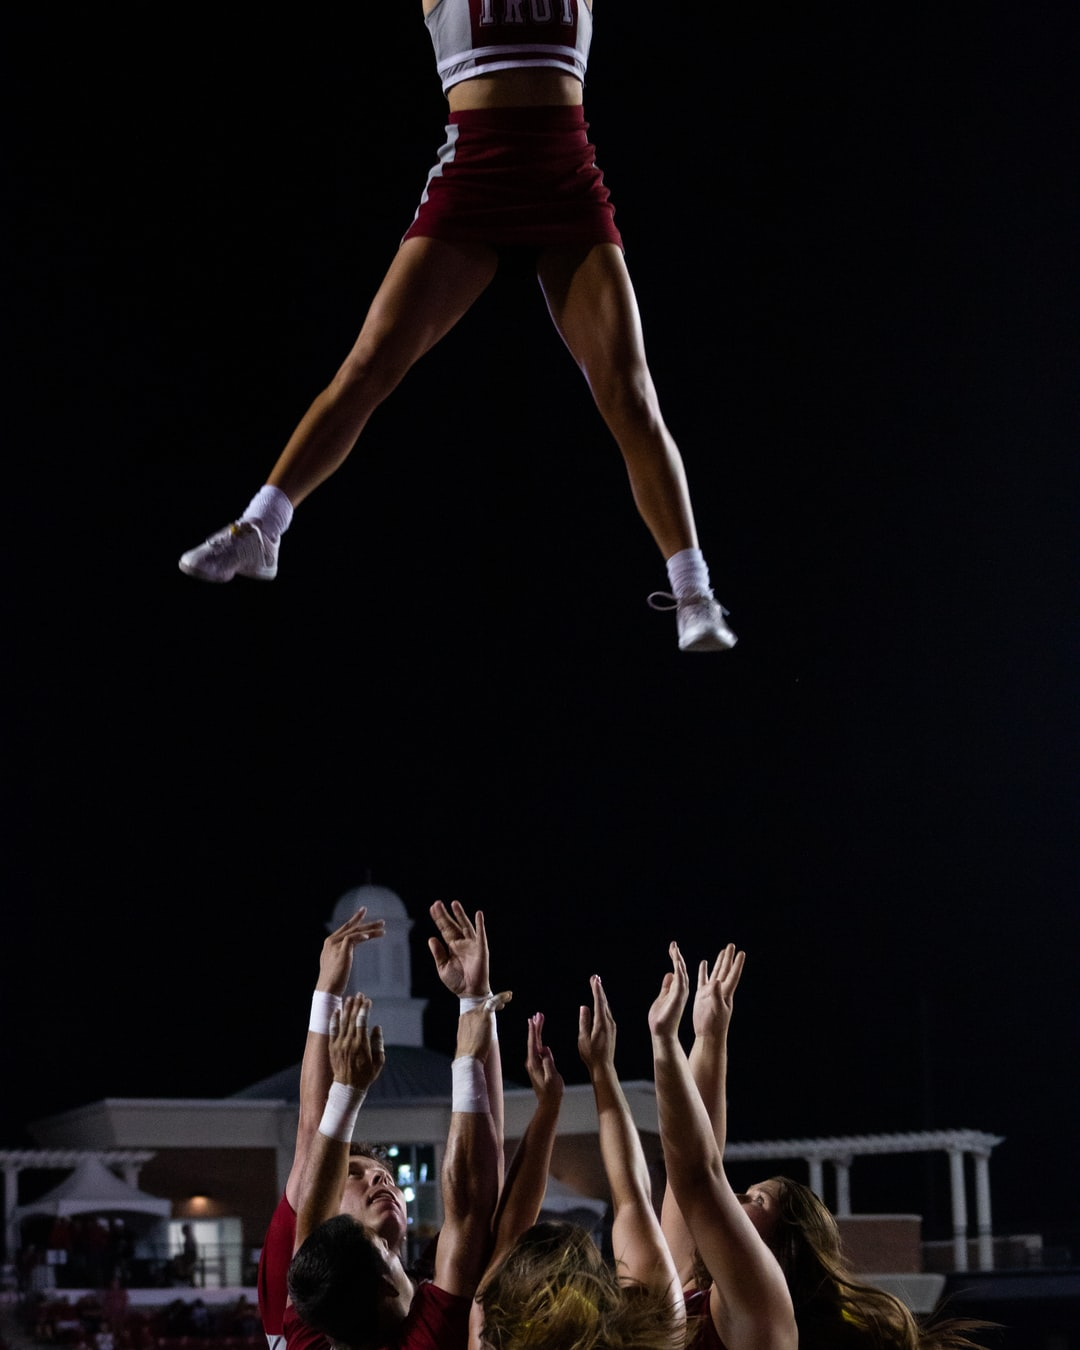 Cheerleader in the air.